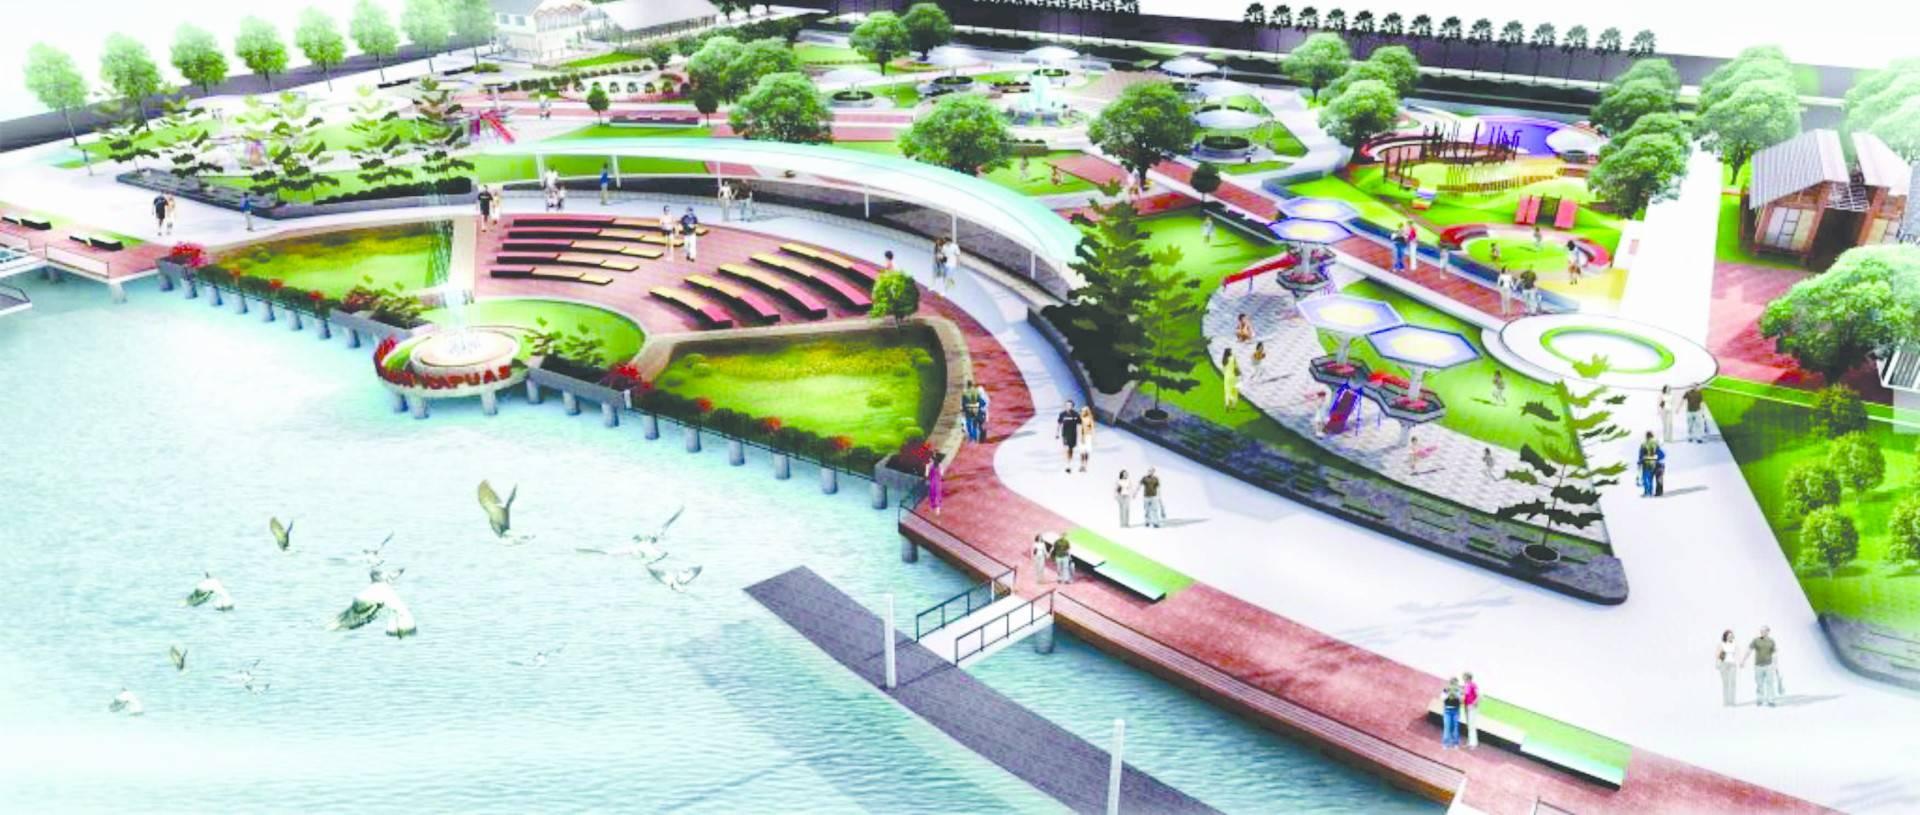 Future Architects Studio Taman Alun Kapuas In Pontianak Pontianak, Indonesia Pontianak, Indonesia Alun-Kapuas-03 Modern  3531